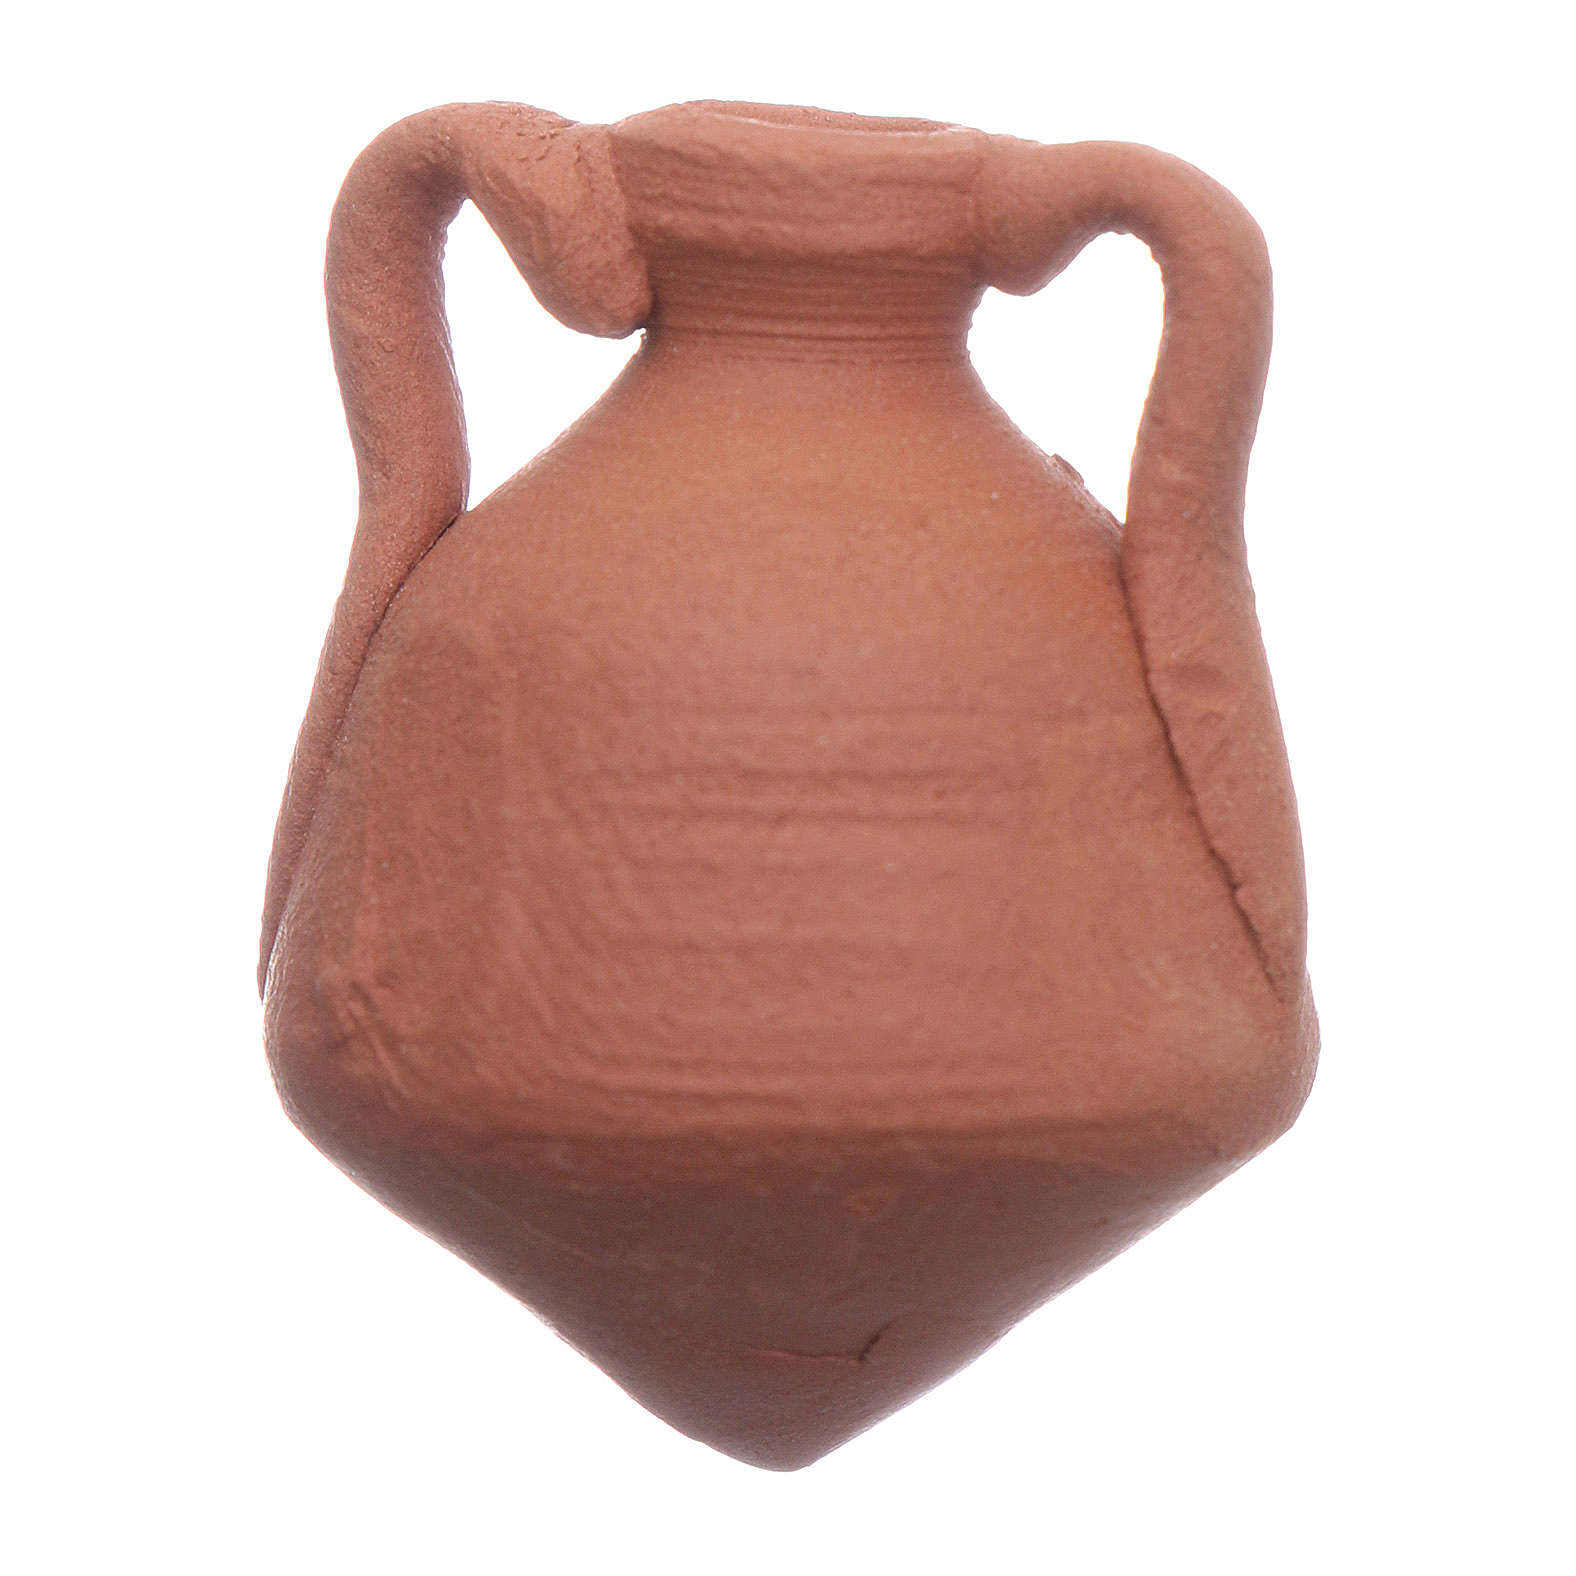 Anfora terracotta presepe 2,5x2 cm 4